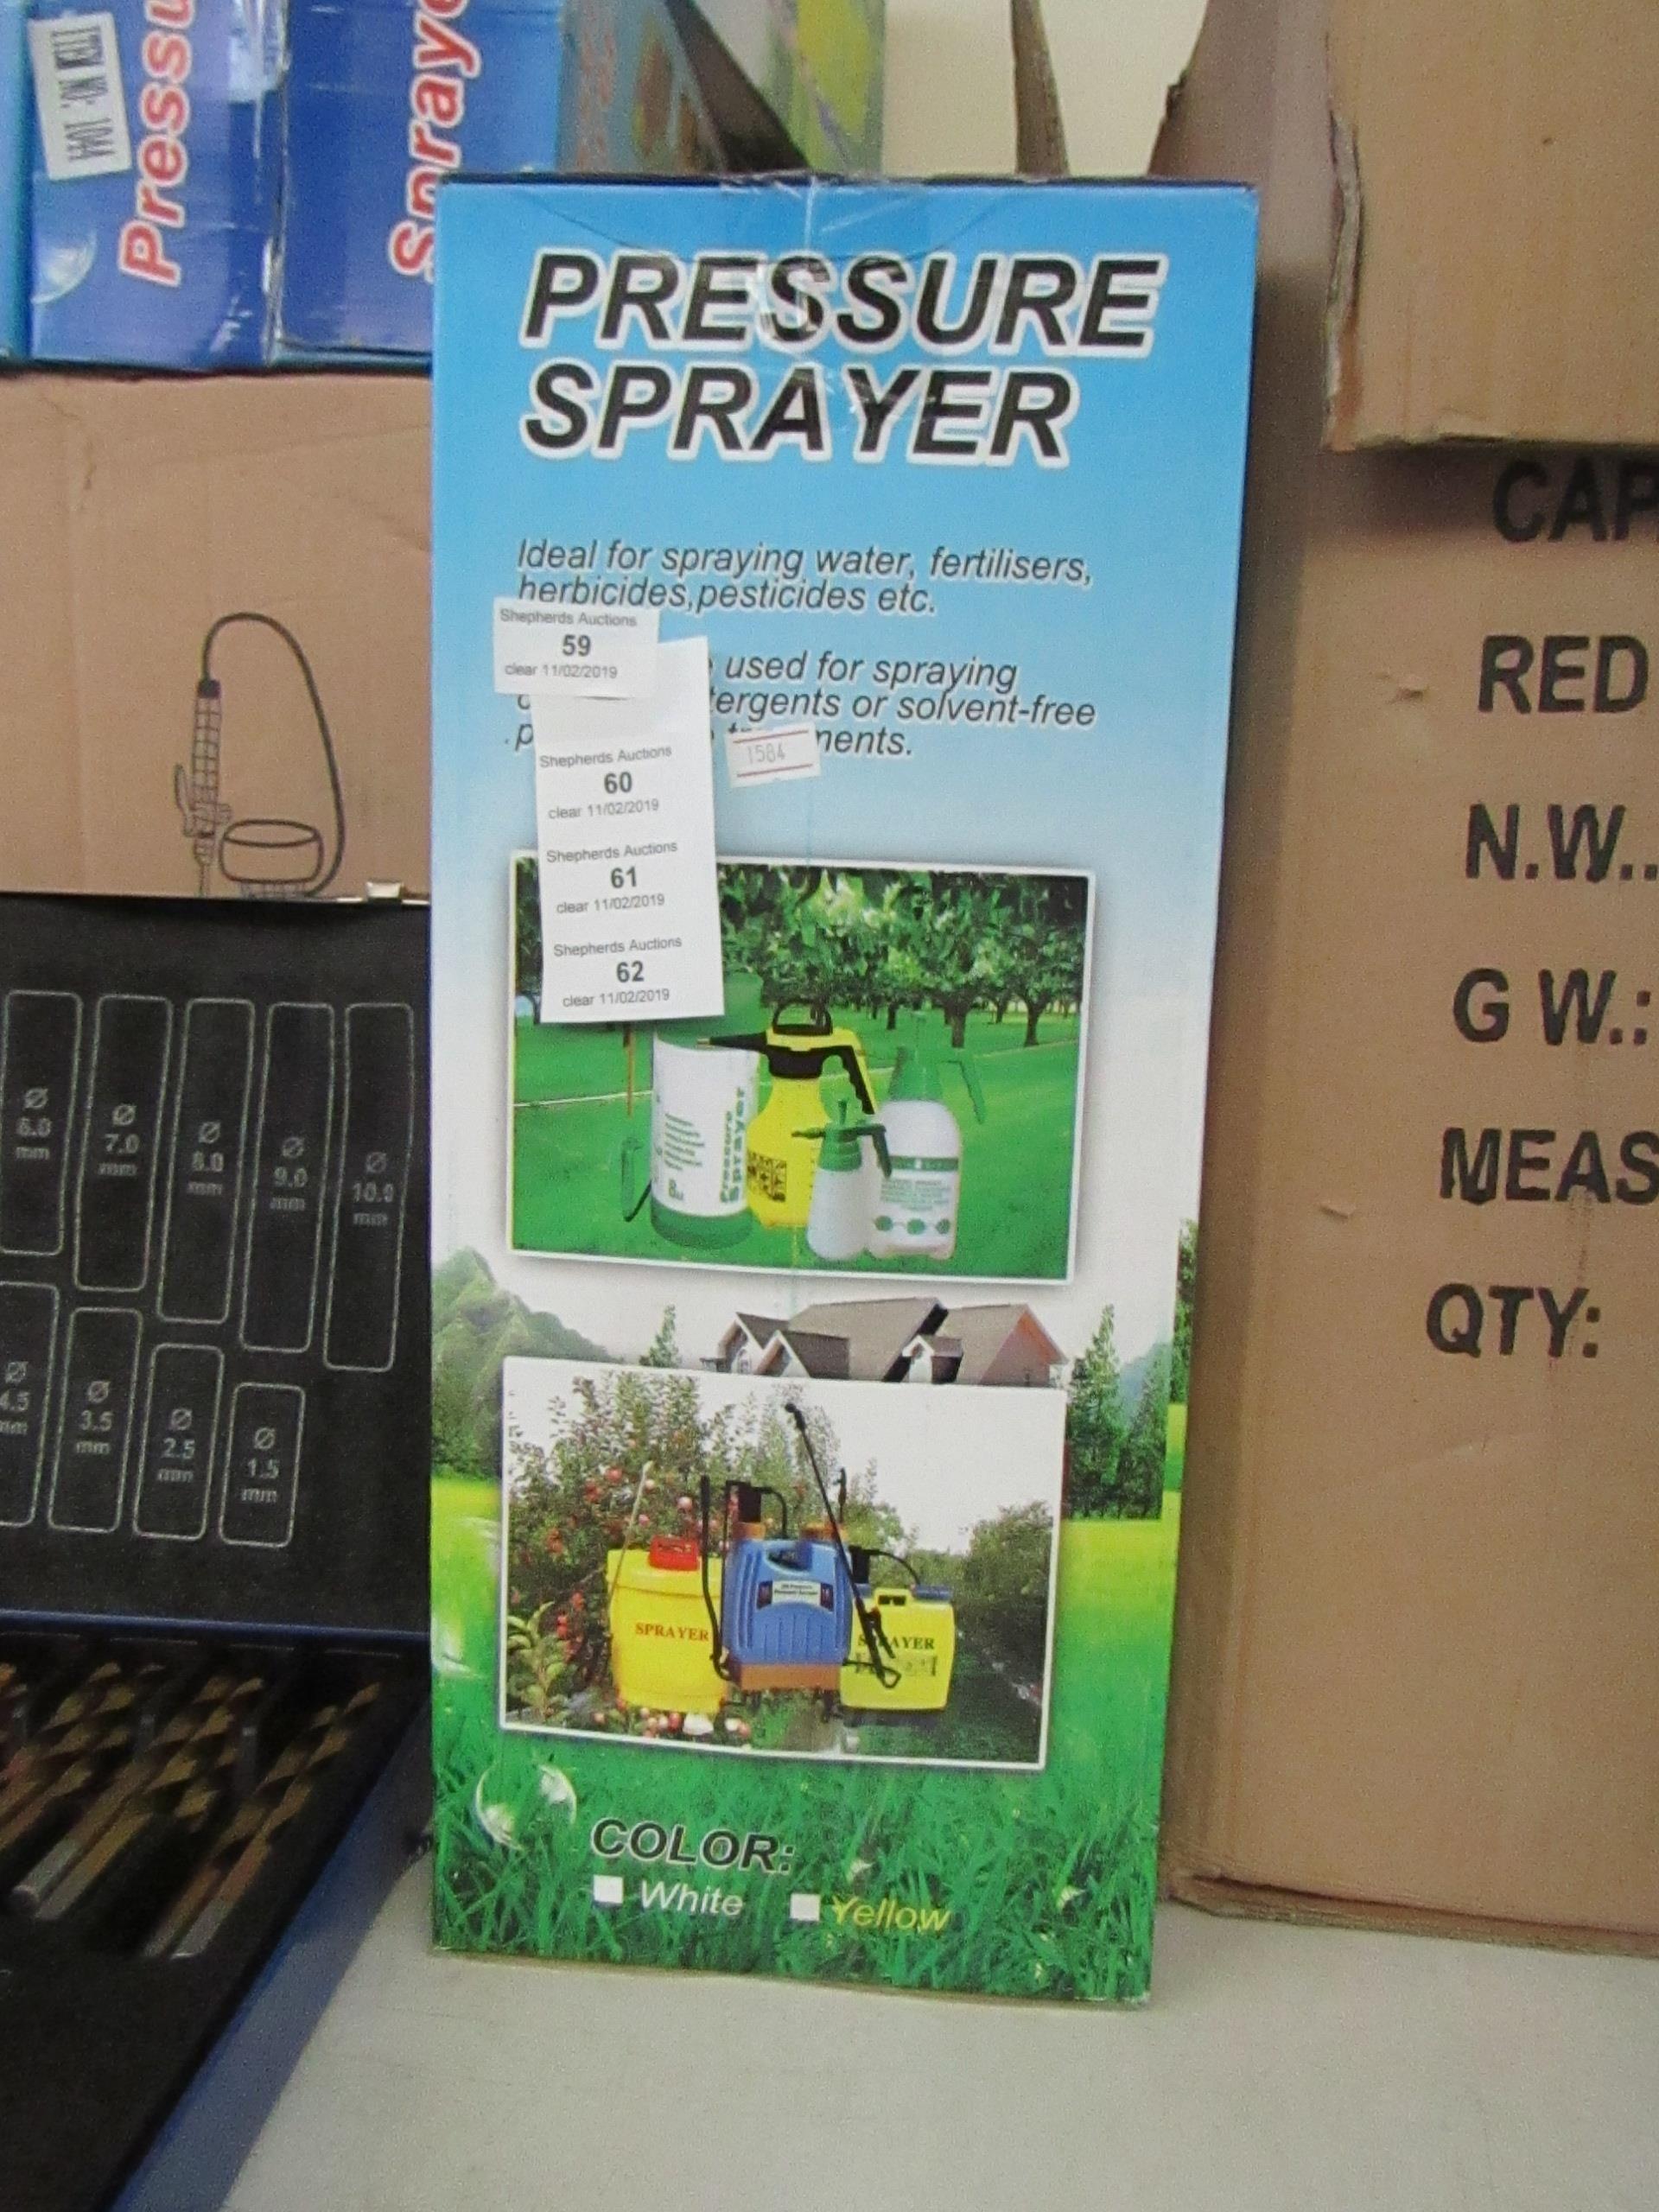 Lot 60 - 5ltr pressure sprayer, new & boxed